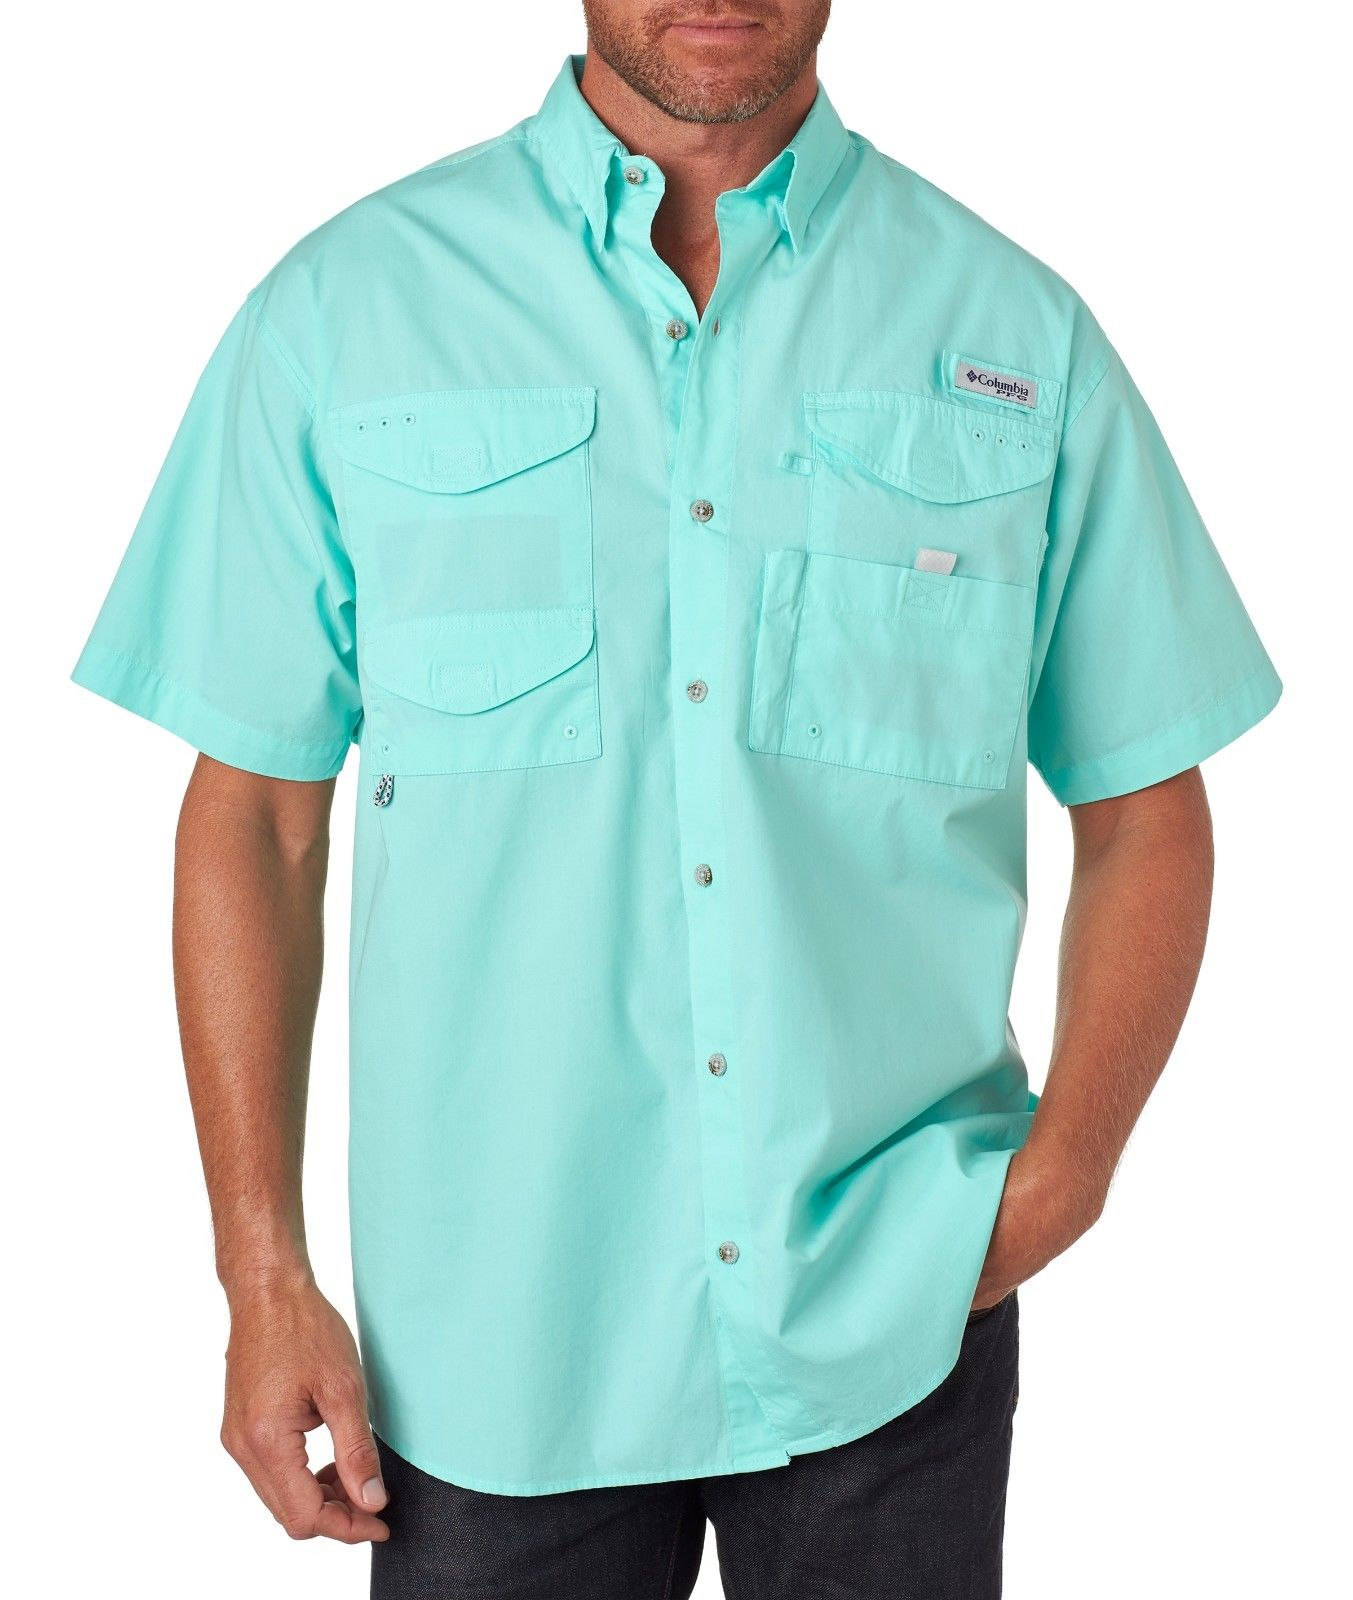 Columbia men 39 s bonehead short sleeve shirt for Columbia bonehead fishing shirt